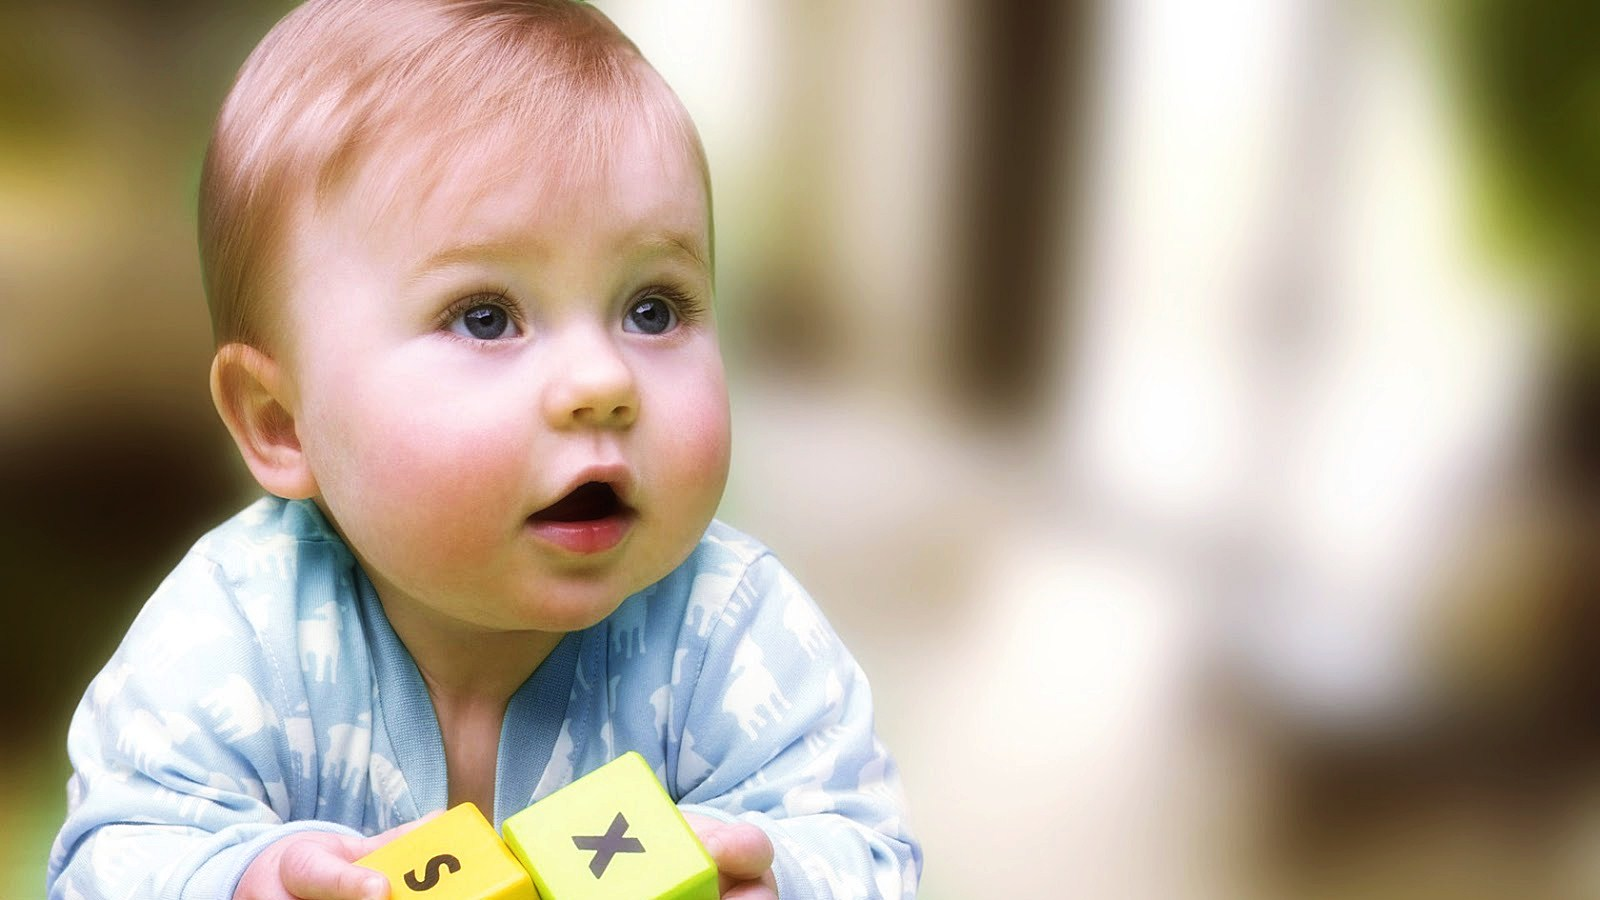 Wonderful Free Wallpaper Baby Boy Te Cute Baby Wallpapers For Desktop Free Download Group 1600x900